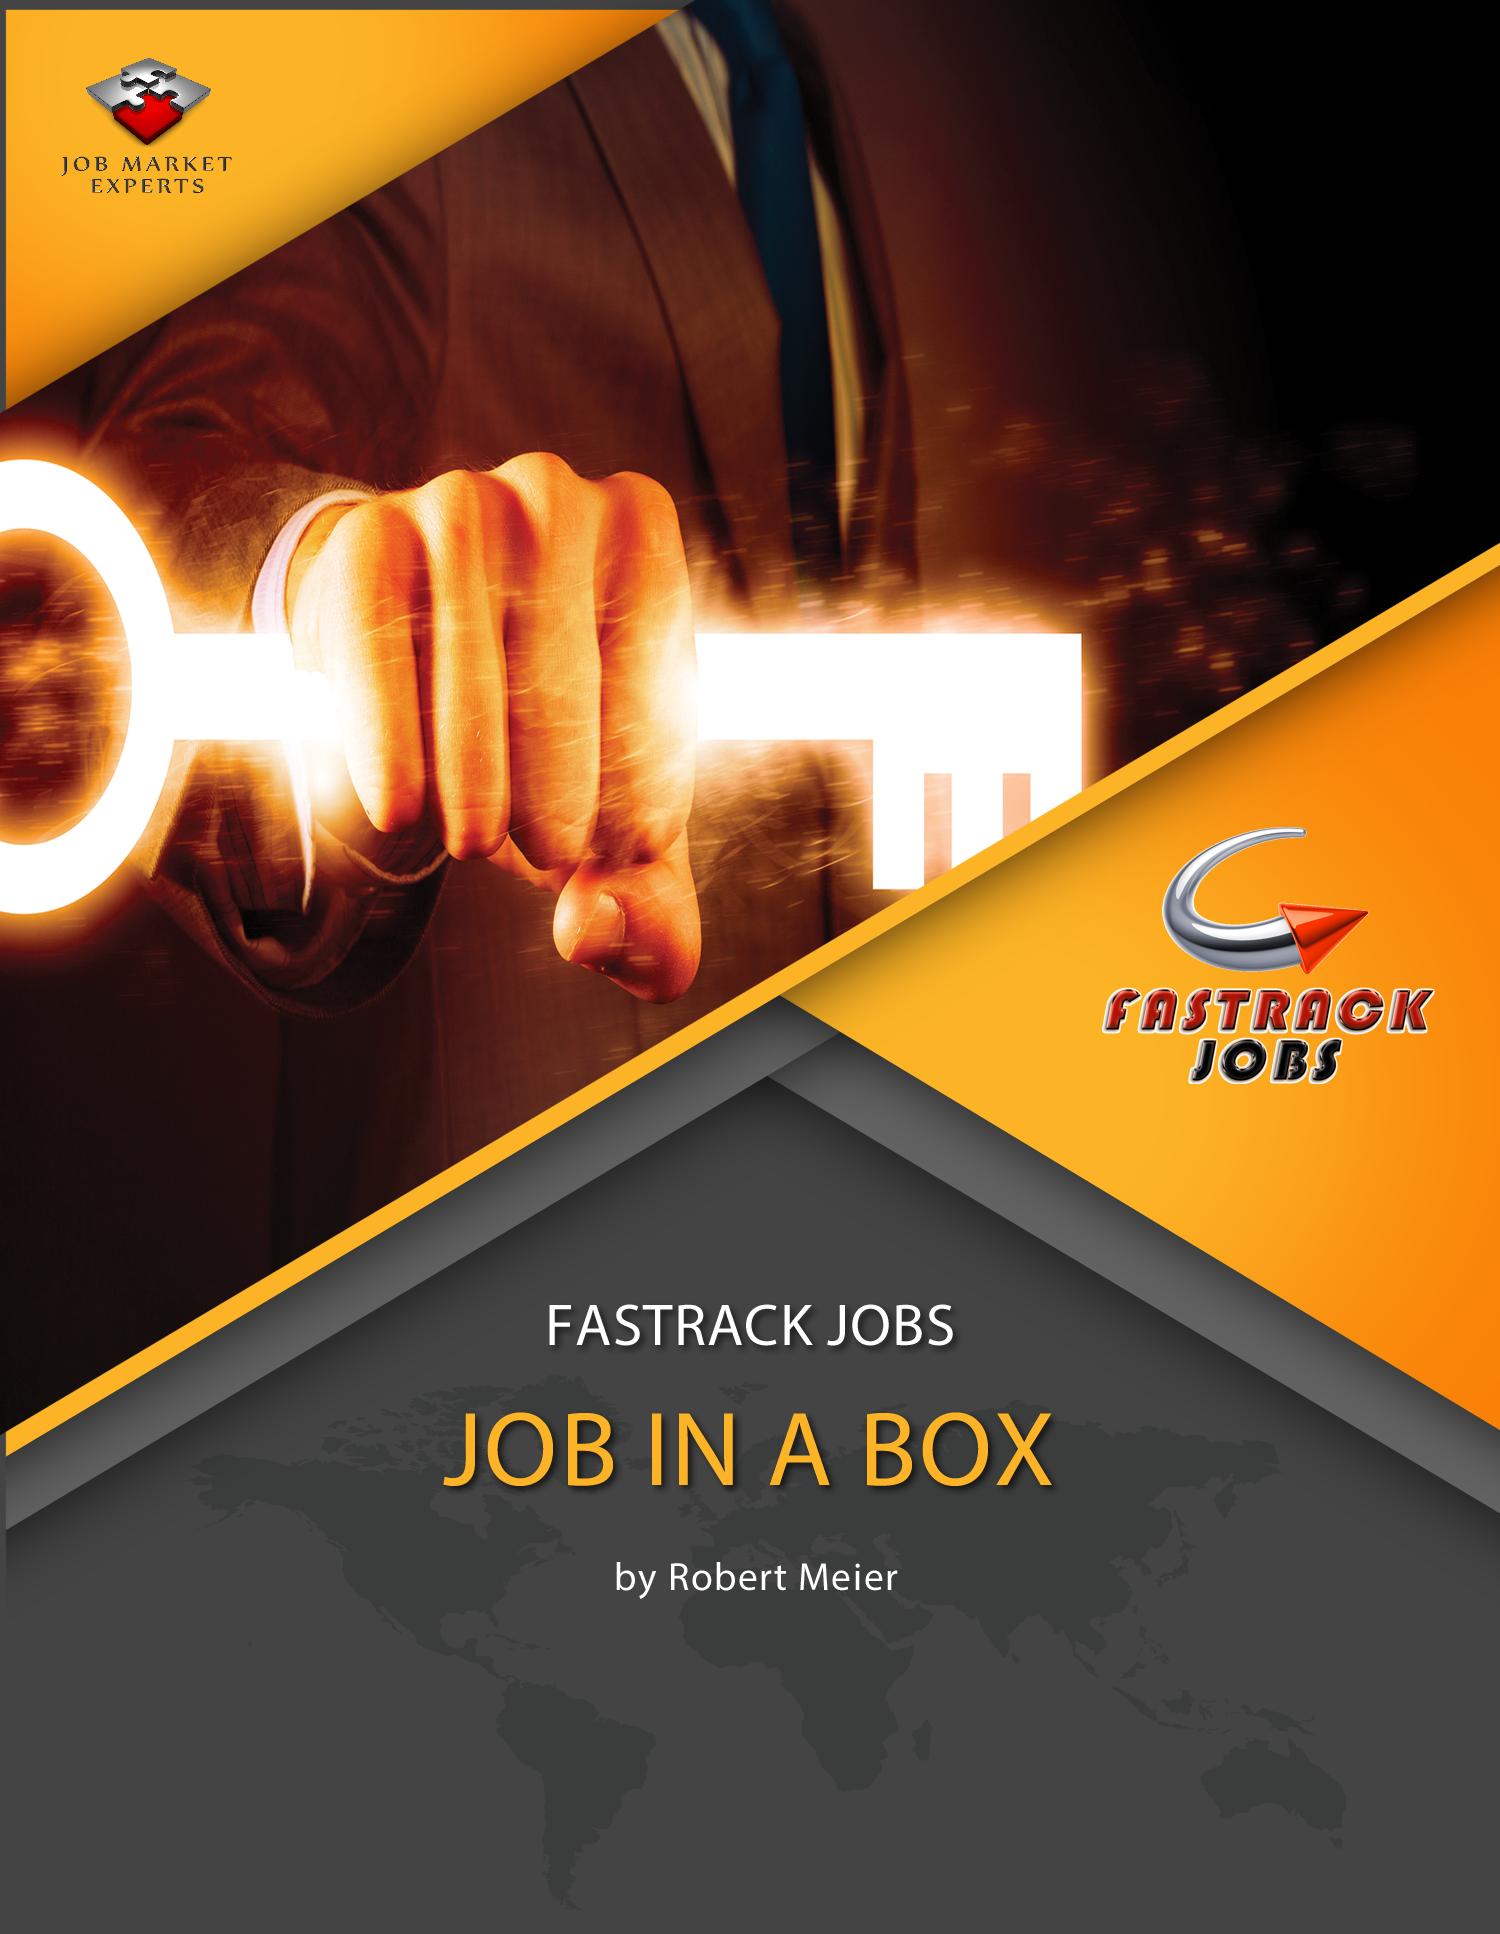 "Job Expert Robert Meier's ""Job in The Box Career Kit"" Will Decidedly Increase the Jobseekers Career Prospects"